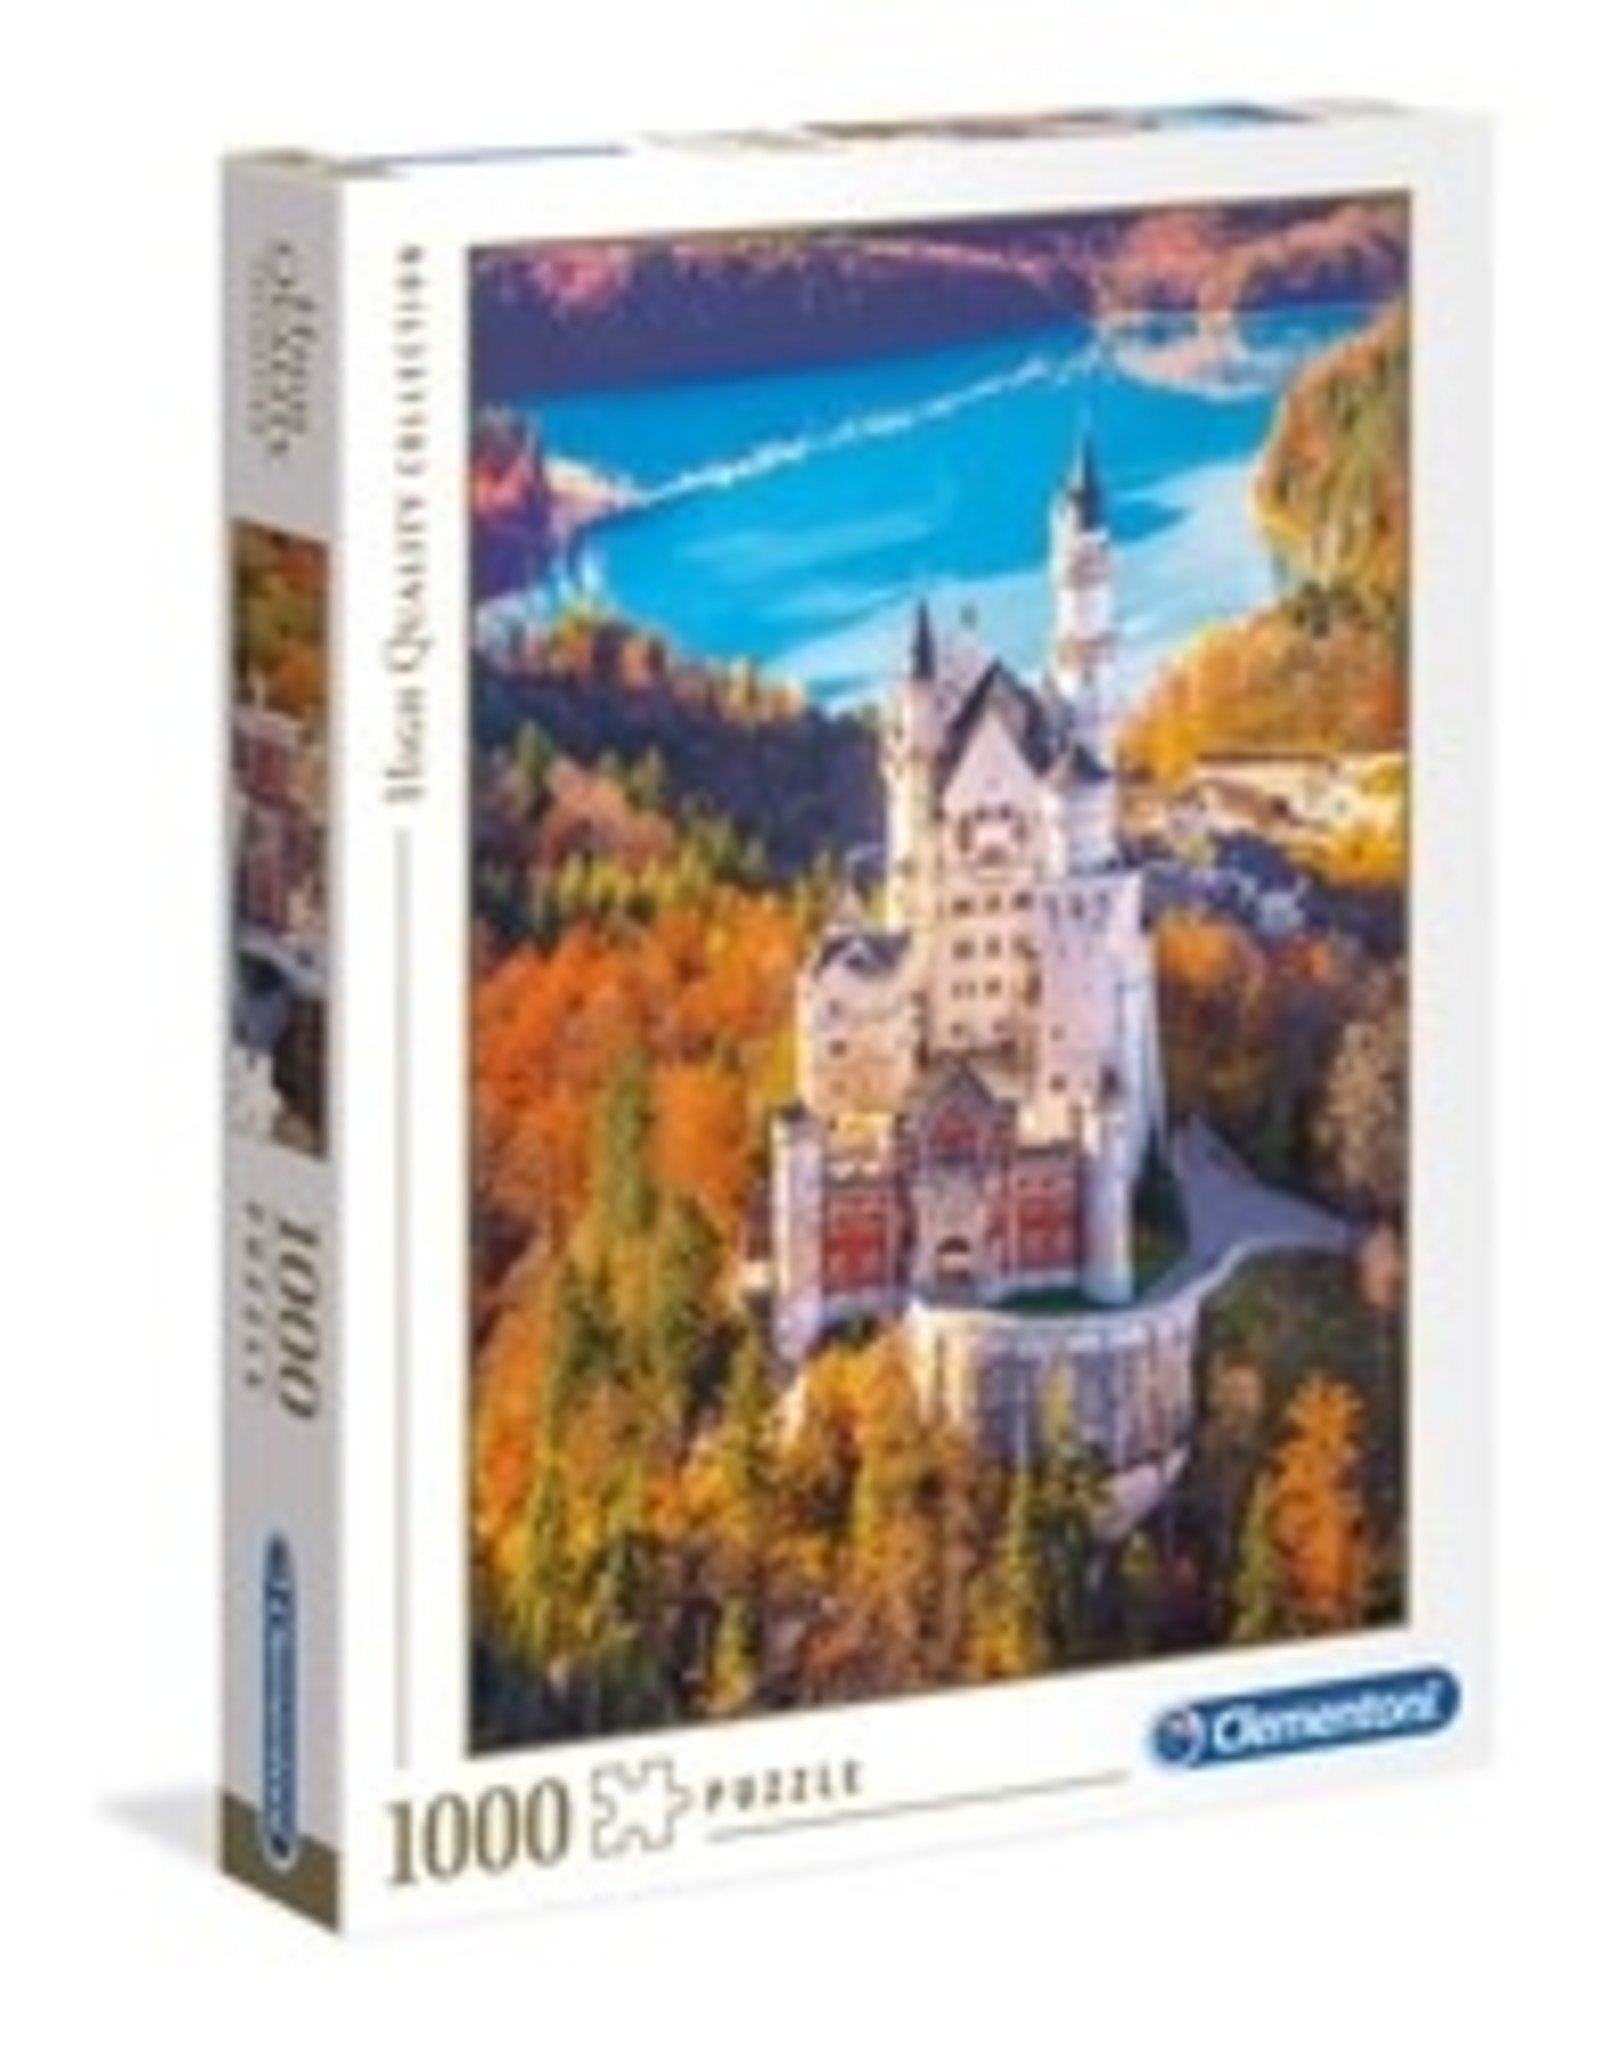 Clementoni Puzzles Neuschwanstein, 1000 pc puzzle